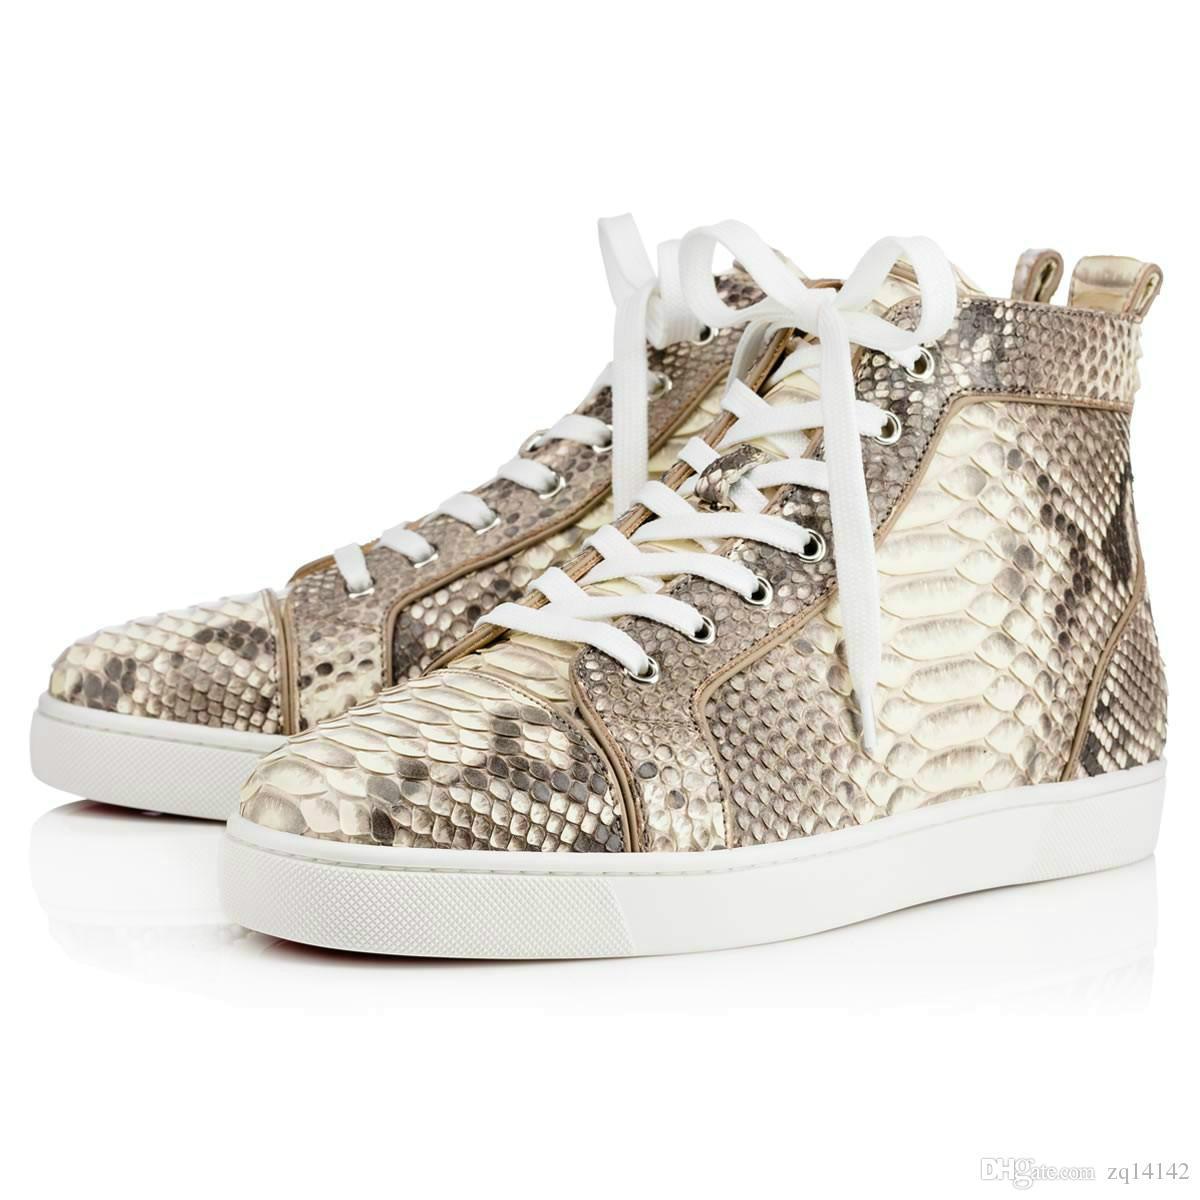 9f1d38890686 Cheap Sports Casual Shoes Breathable Men Women Best Casual Shoe Styles for  Men